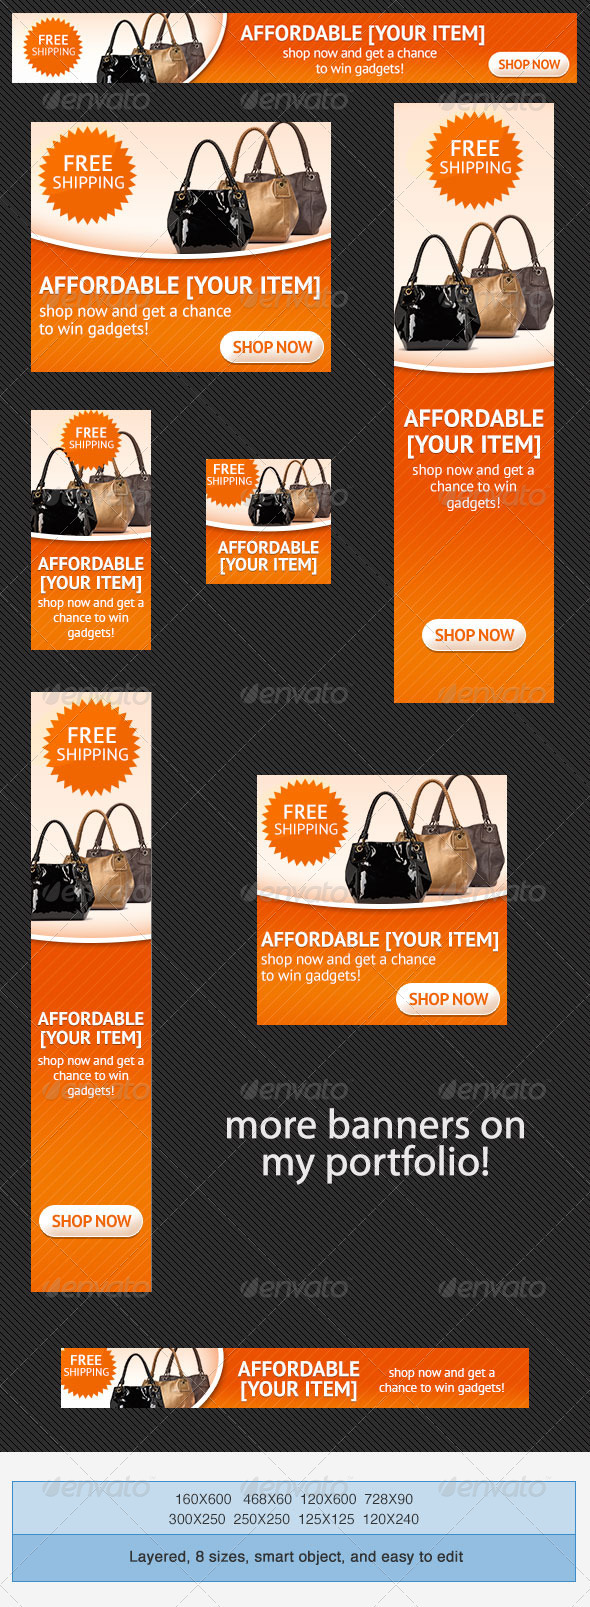 free advertising templates